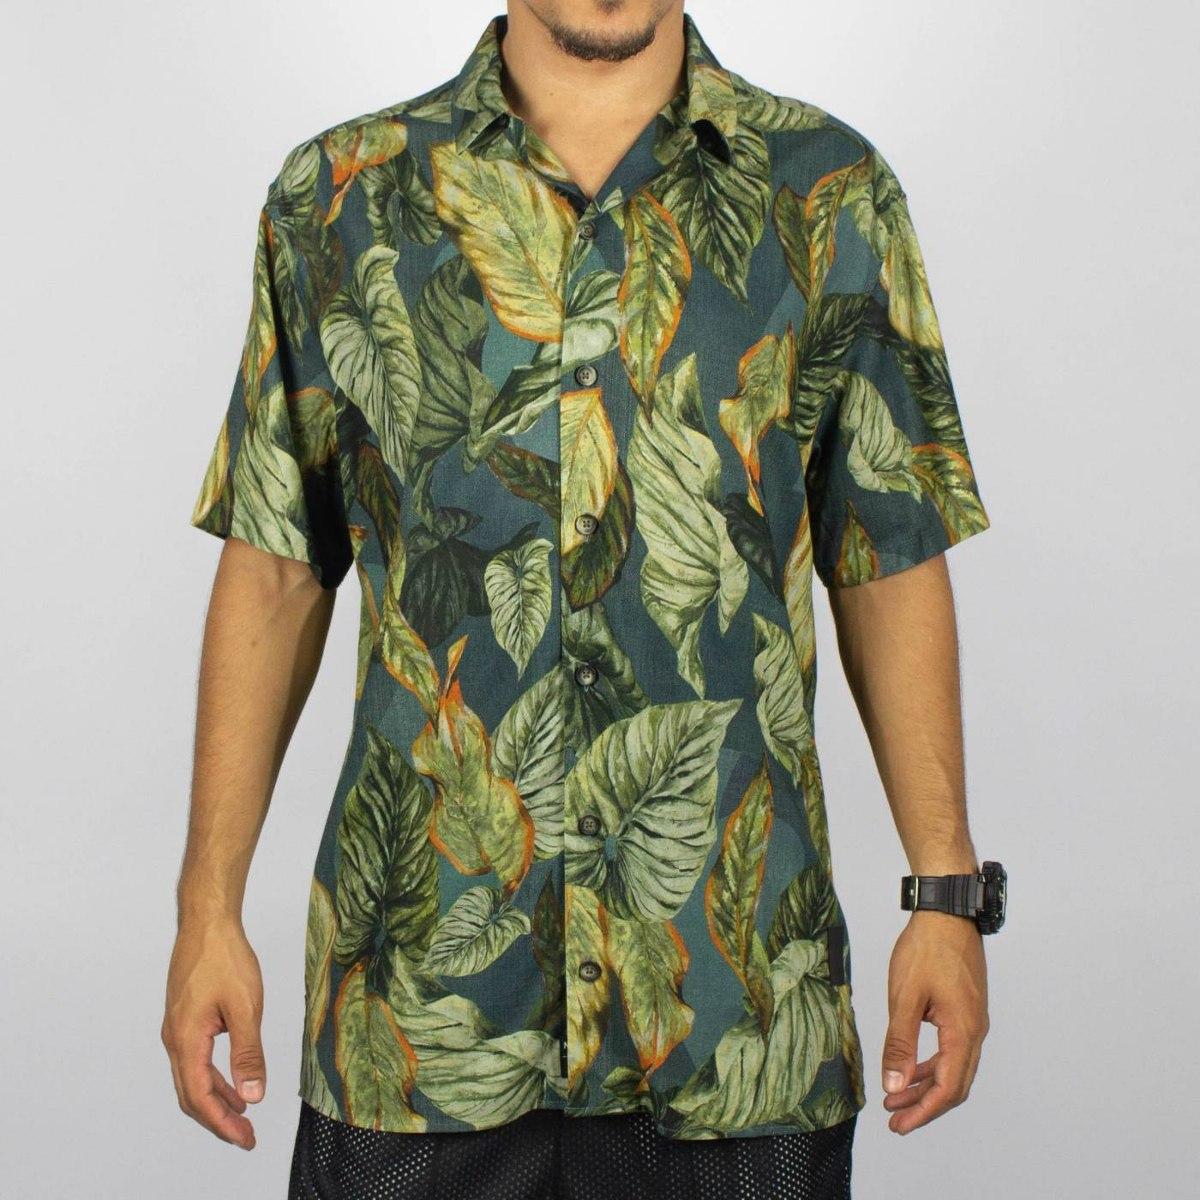 51f72bd555 camisa floral mcd atlantic forest musgo original. Carregando zoom.